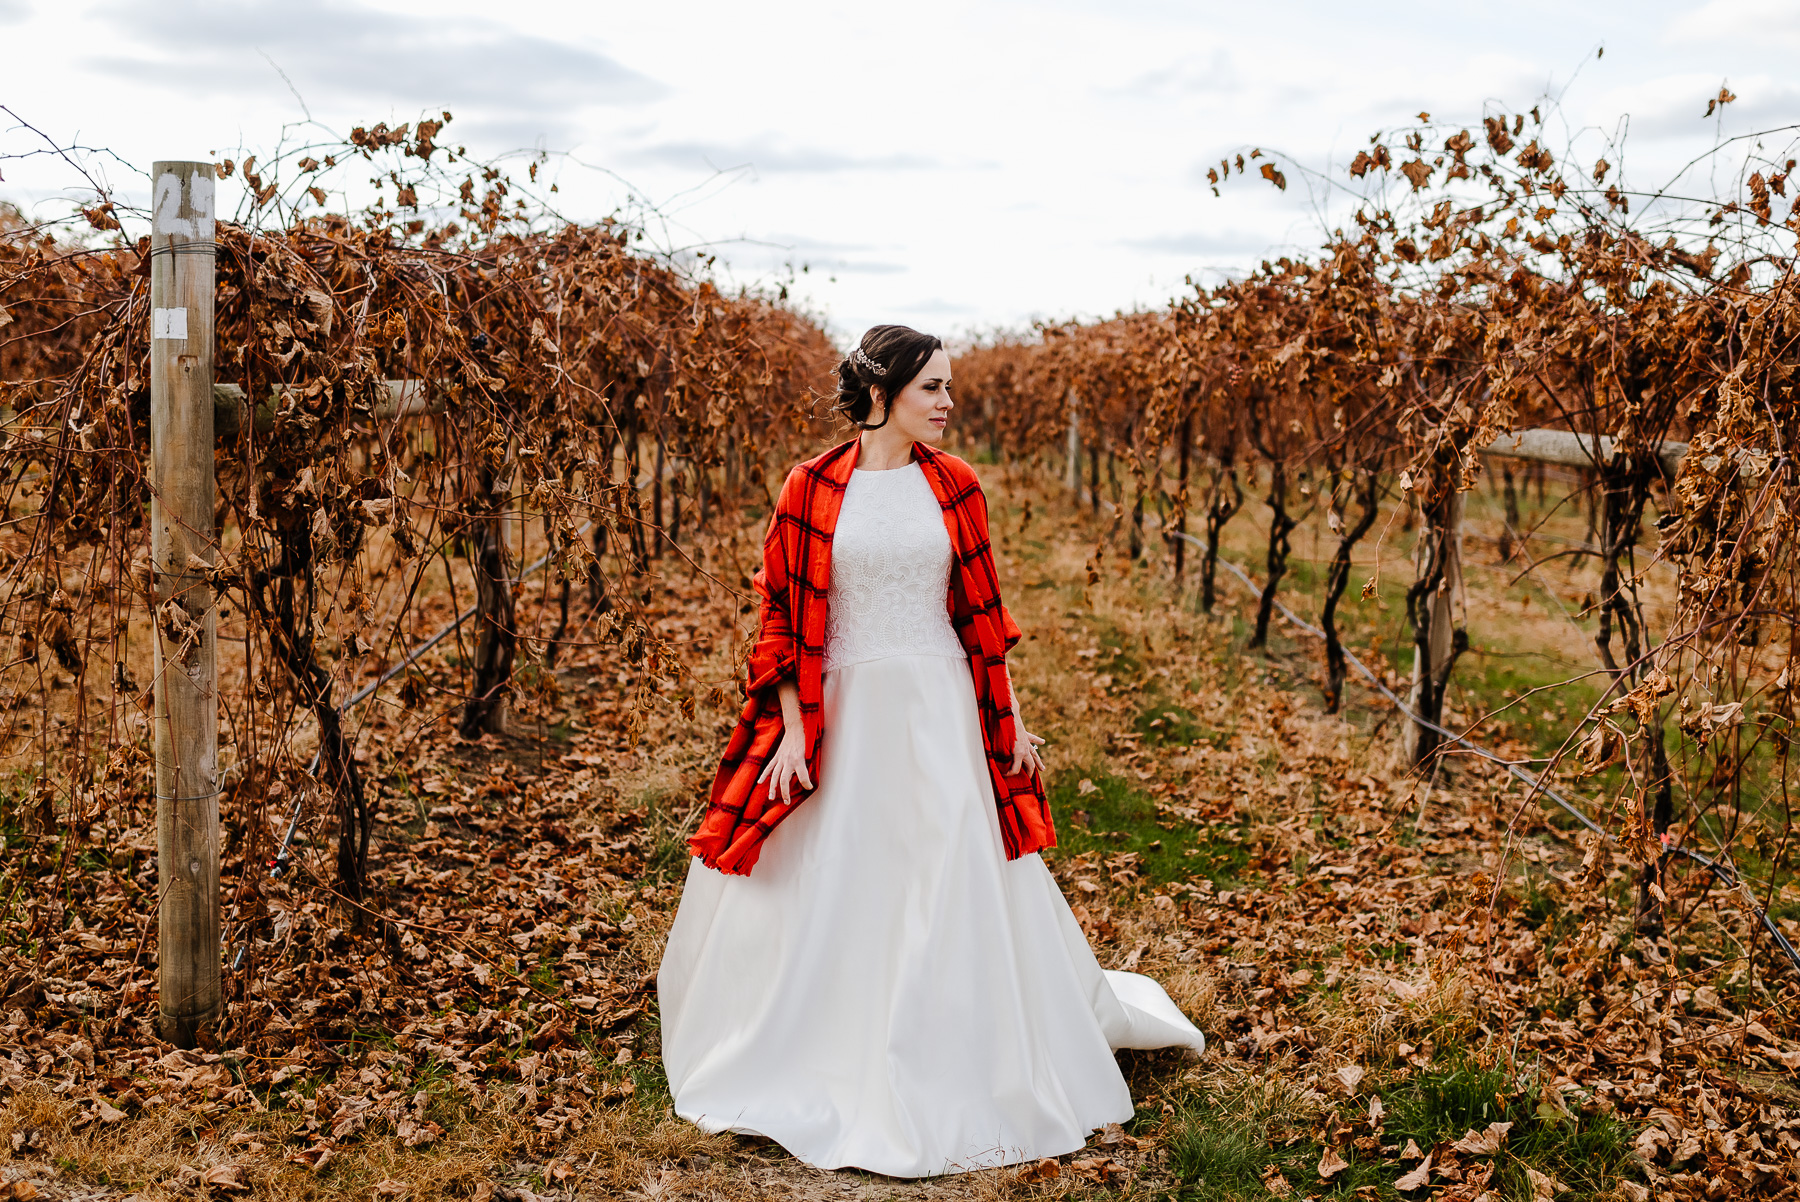 54-Laurita Winery Wedding New Jersey Wedding Photographer Laurita Winery Weddings Longbrook Photography.jpg